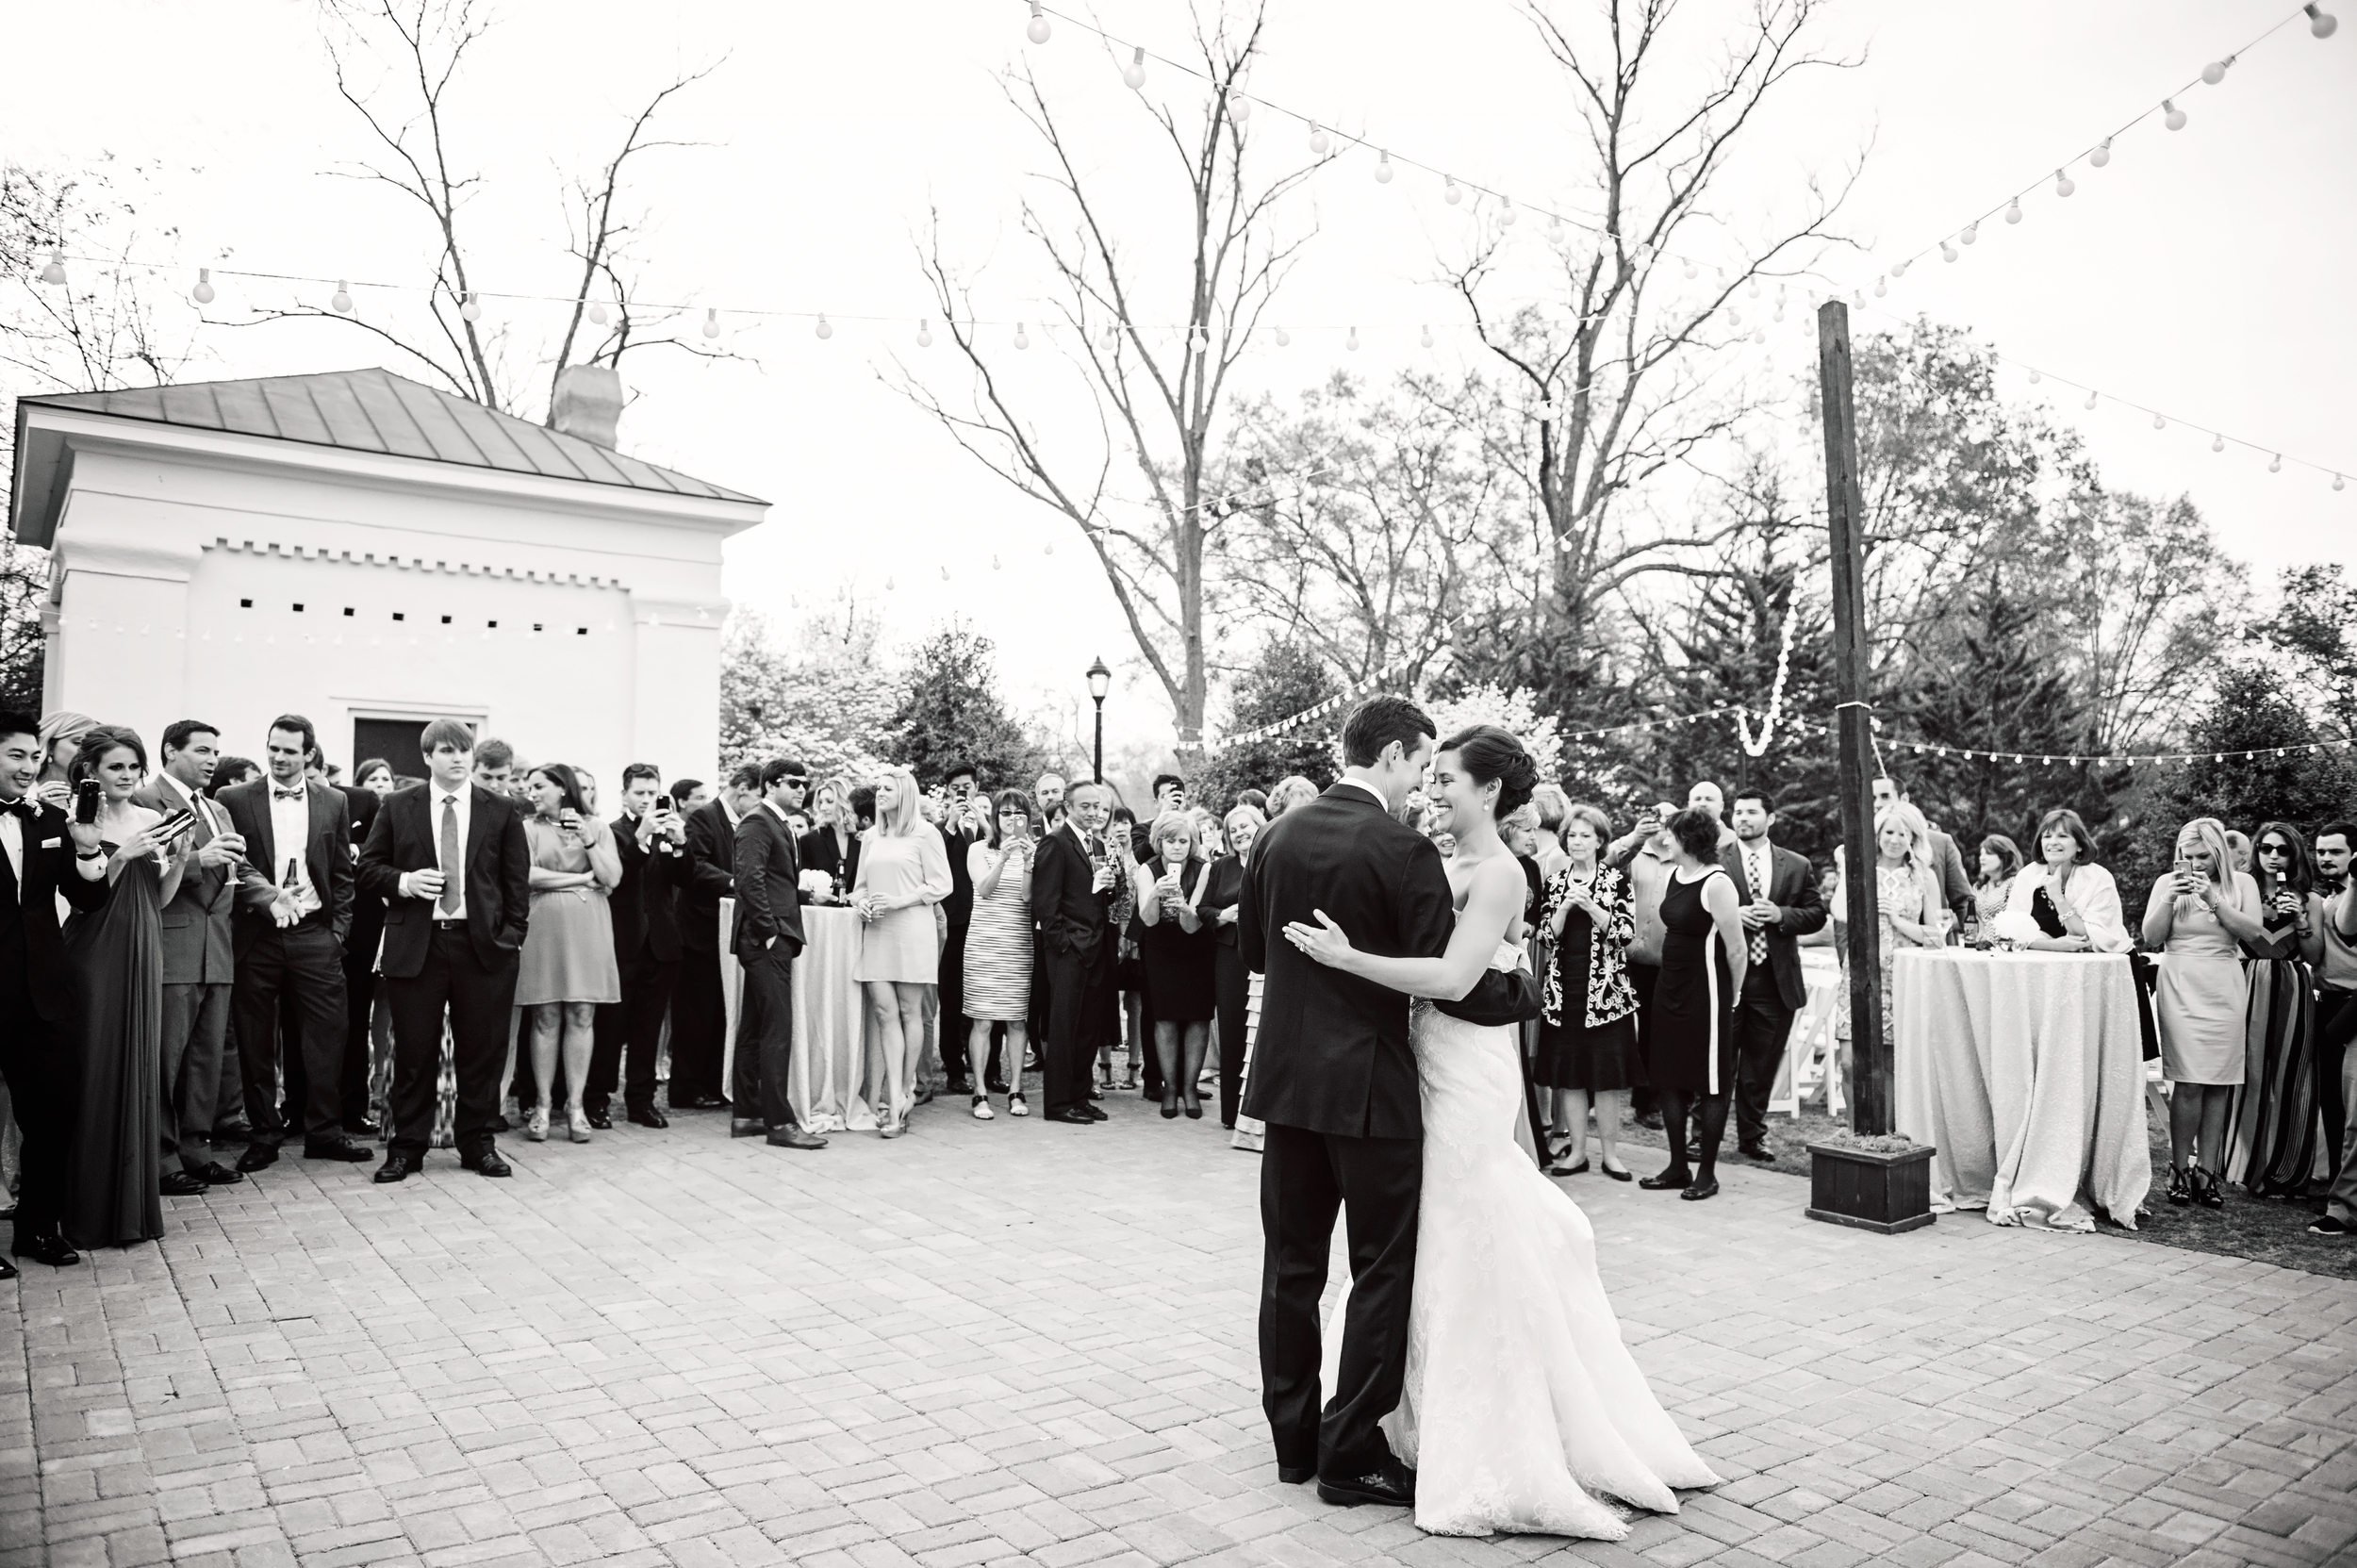 Kanavage_Wedding-49.jpg